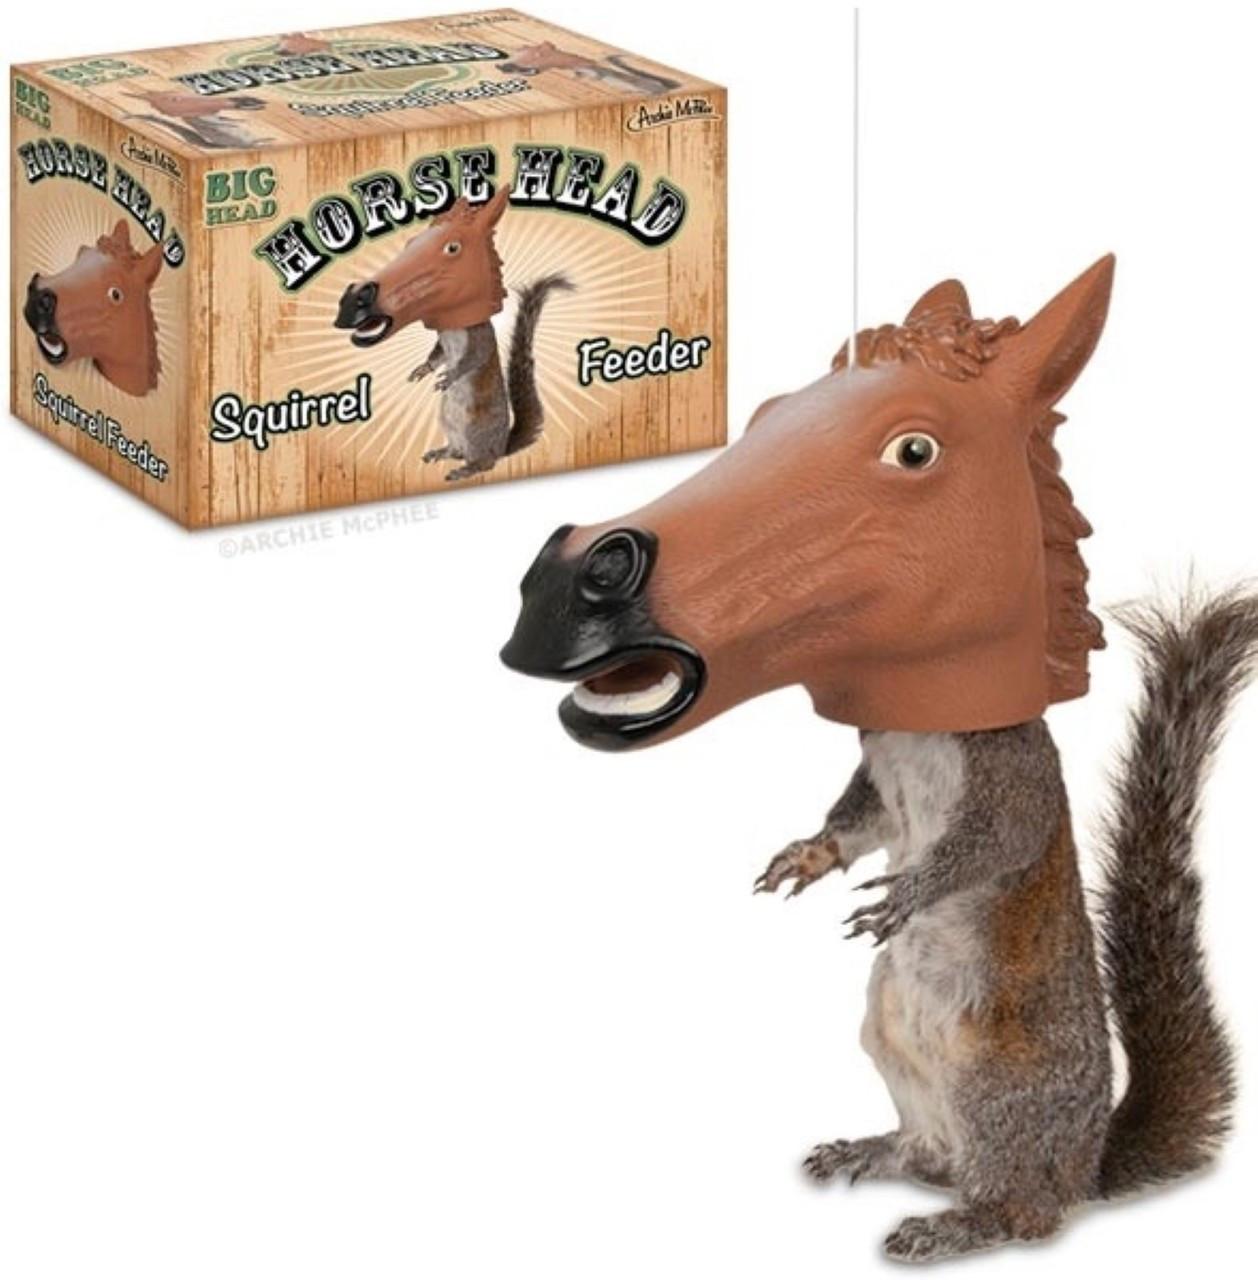 Horse Head Squirrel Feeder The Novelty Shoppe